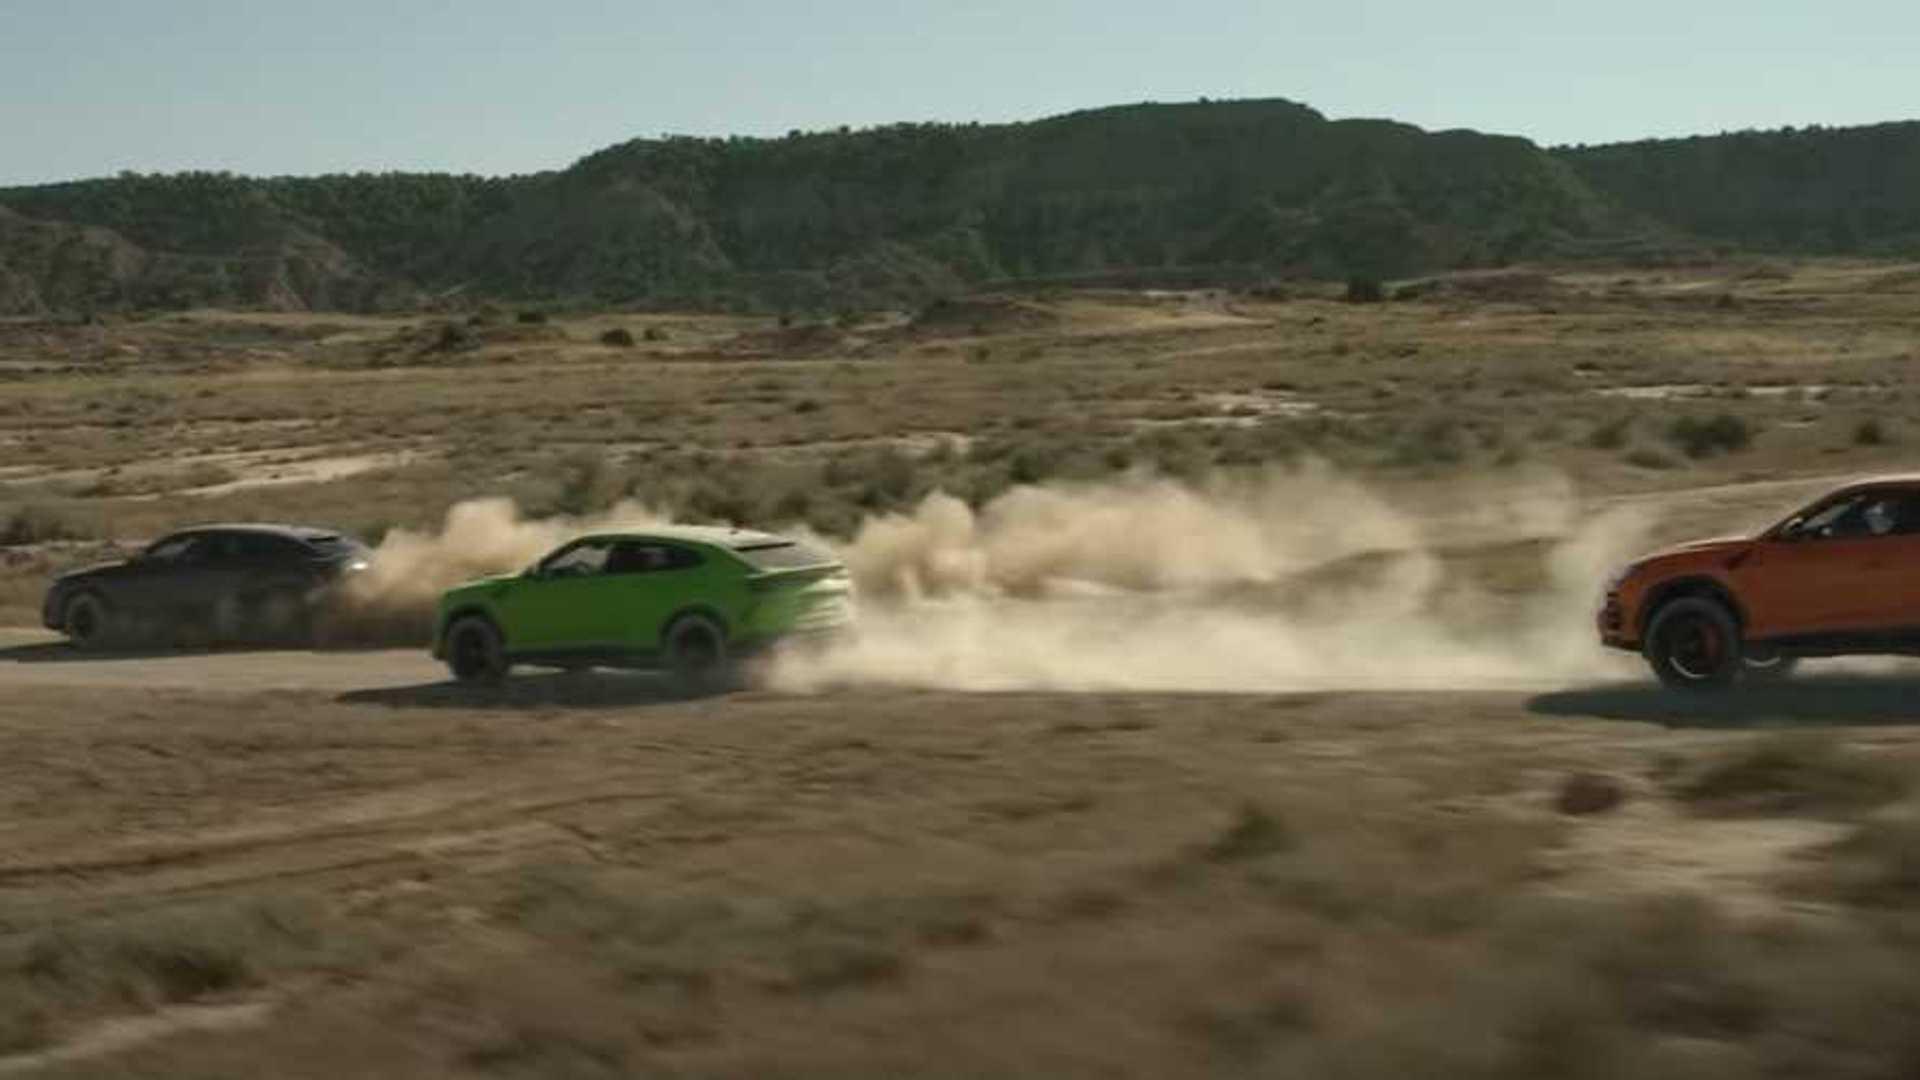 Lamborghini Flaunts New Urus Pearl Colors In Action-Filled Video